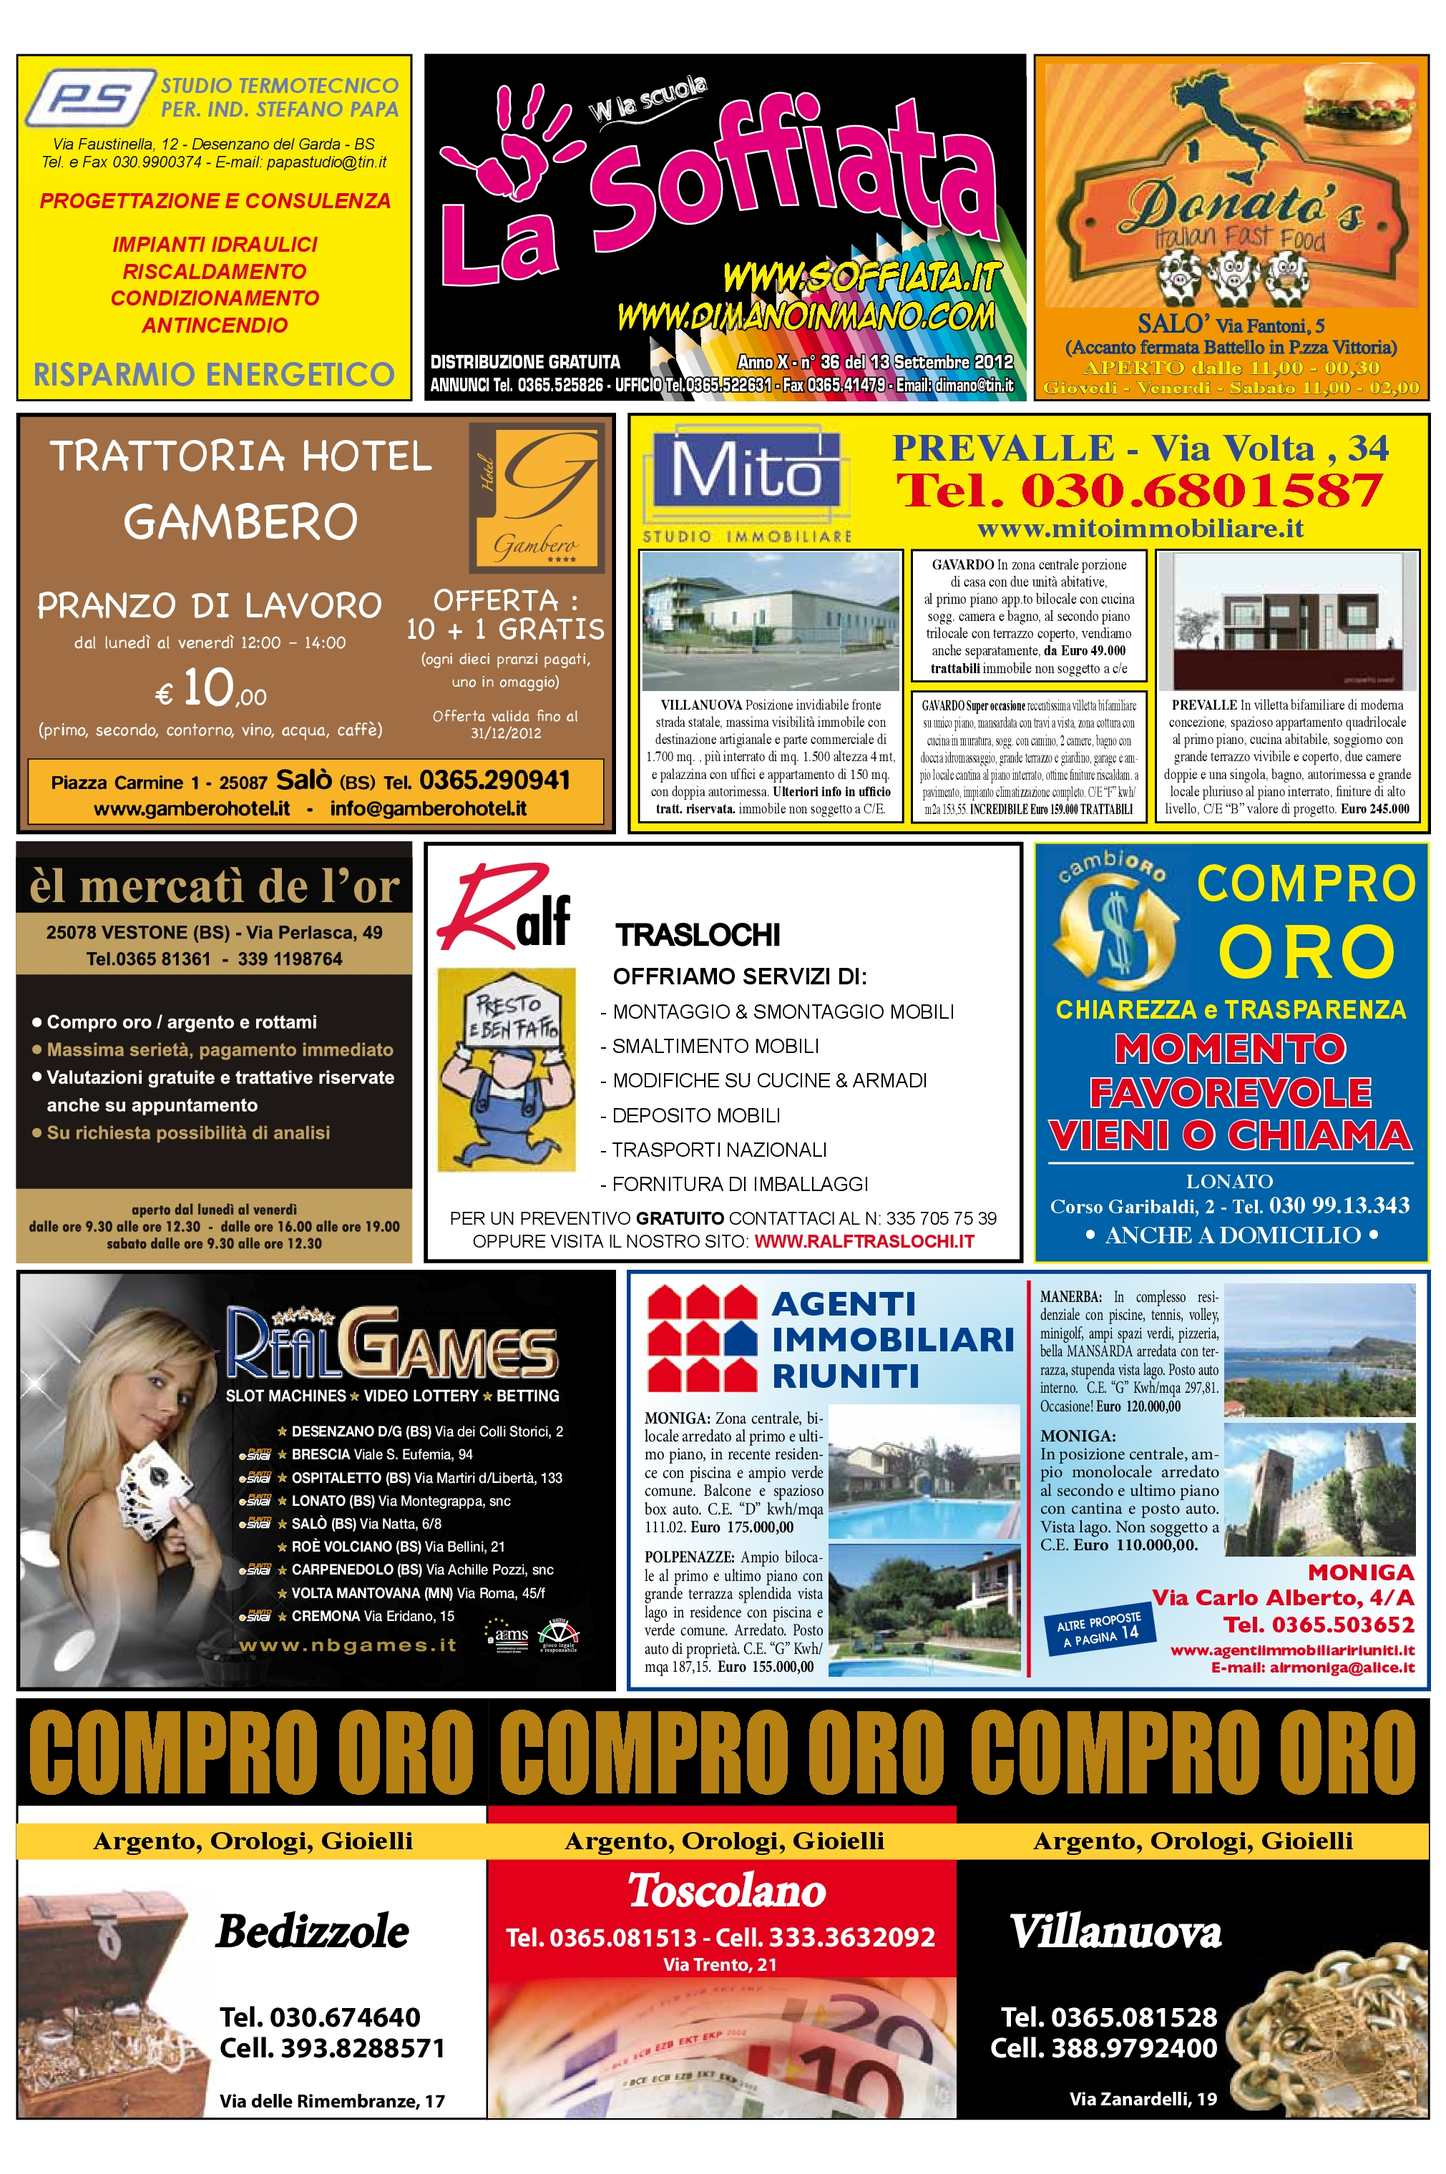 Calameo La Soffiata 13 09 2012